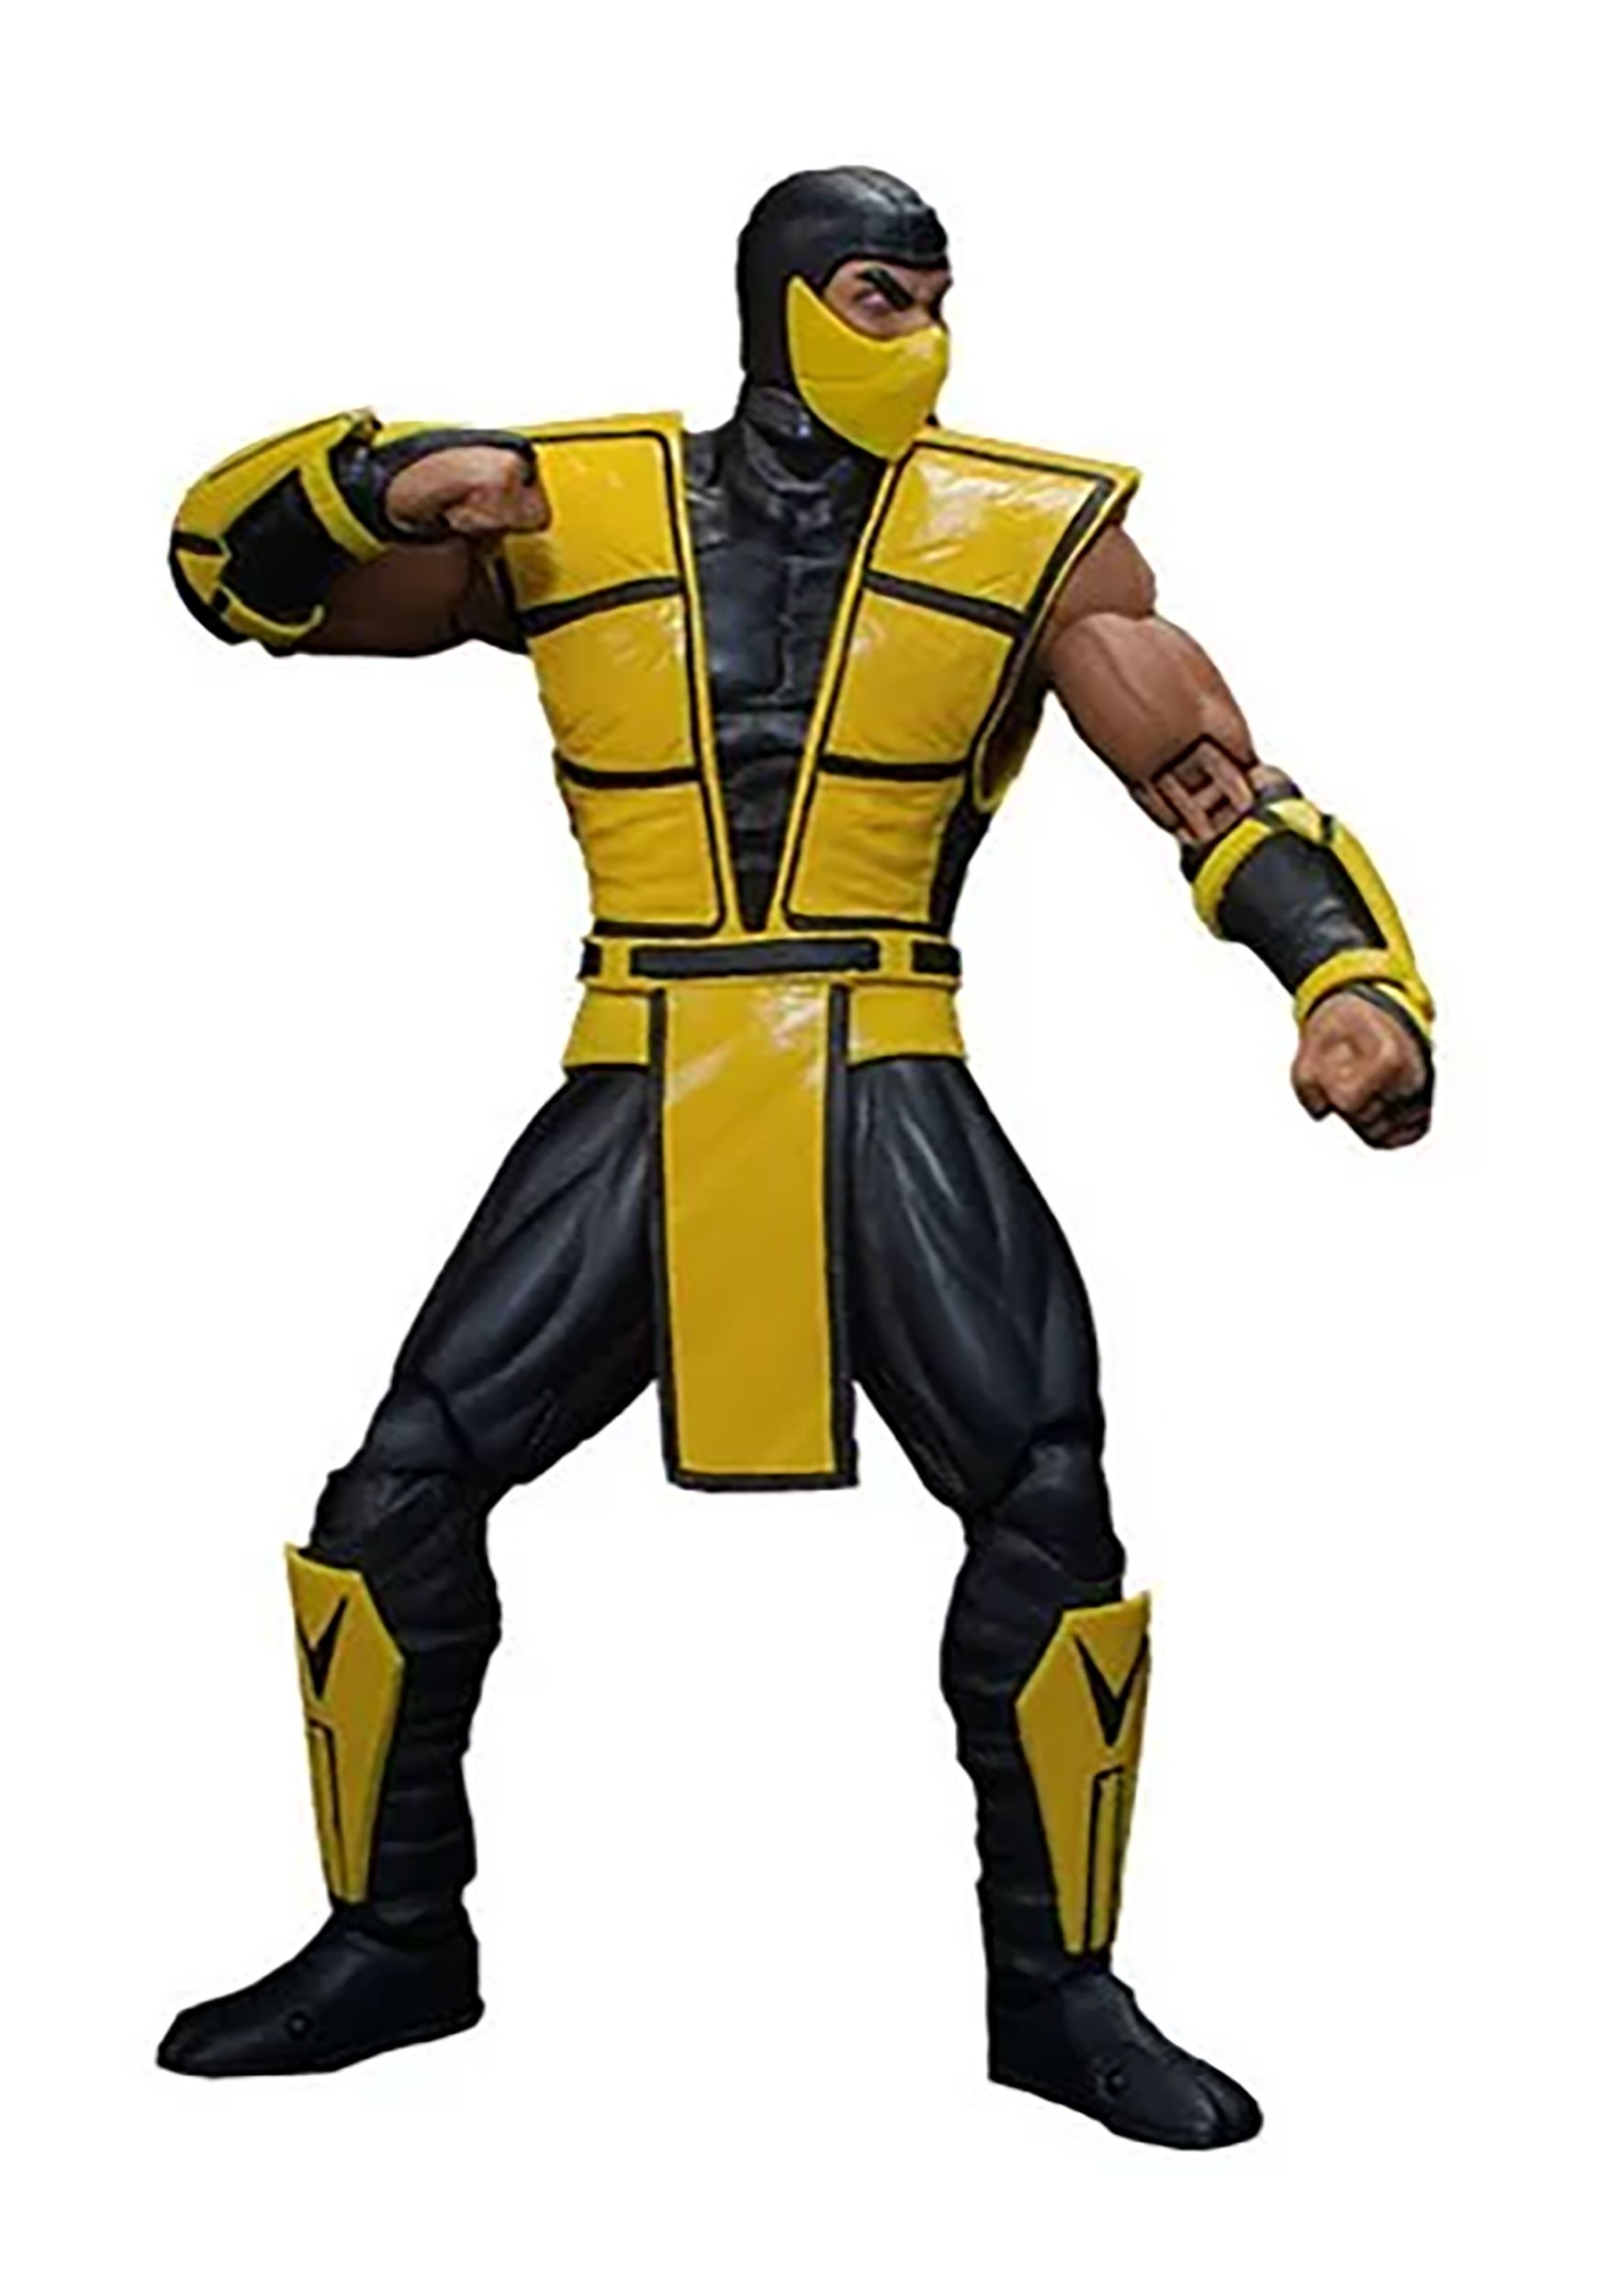 Mortal_Kombat_3_Scorpion_Storm_112_Scale_Collectible_Action_Figure